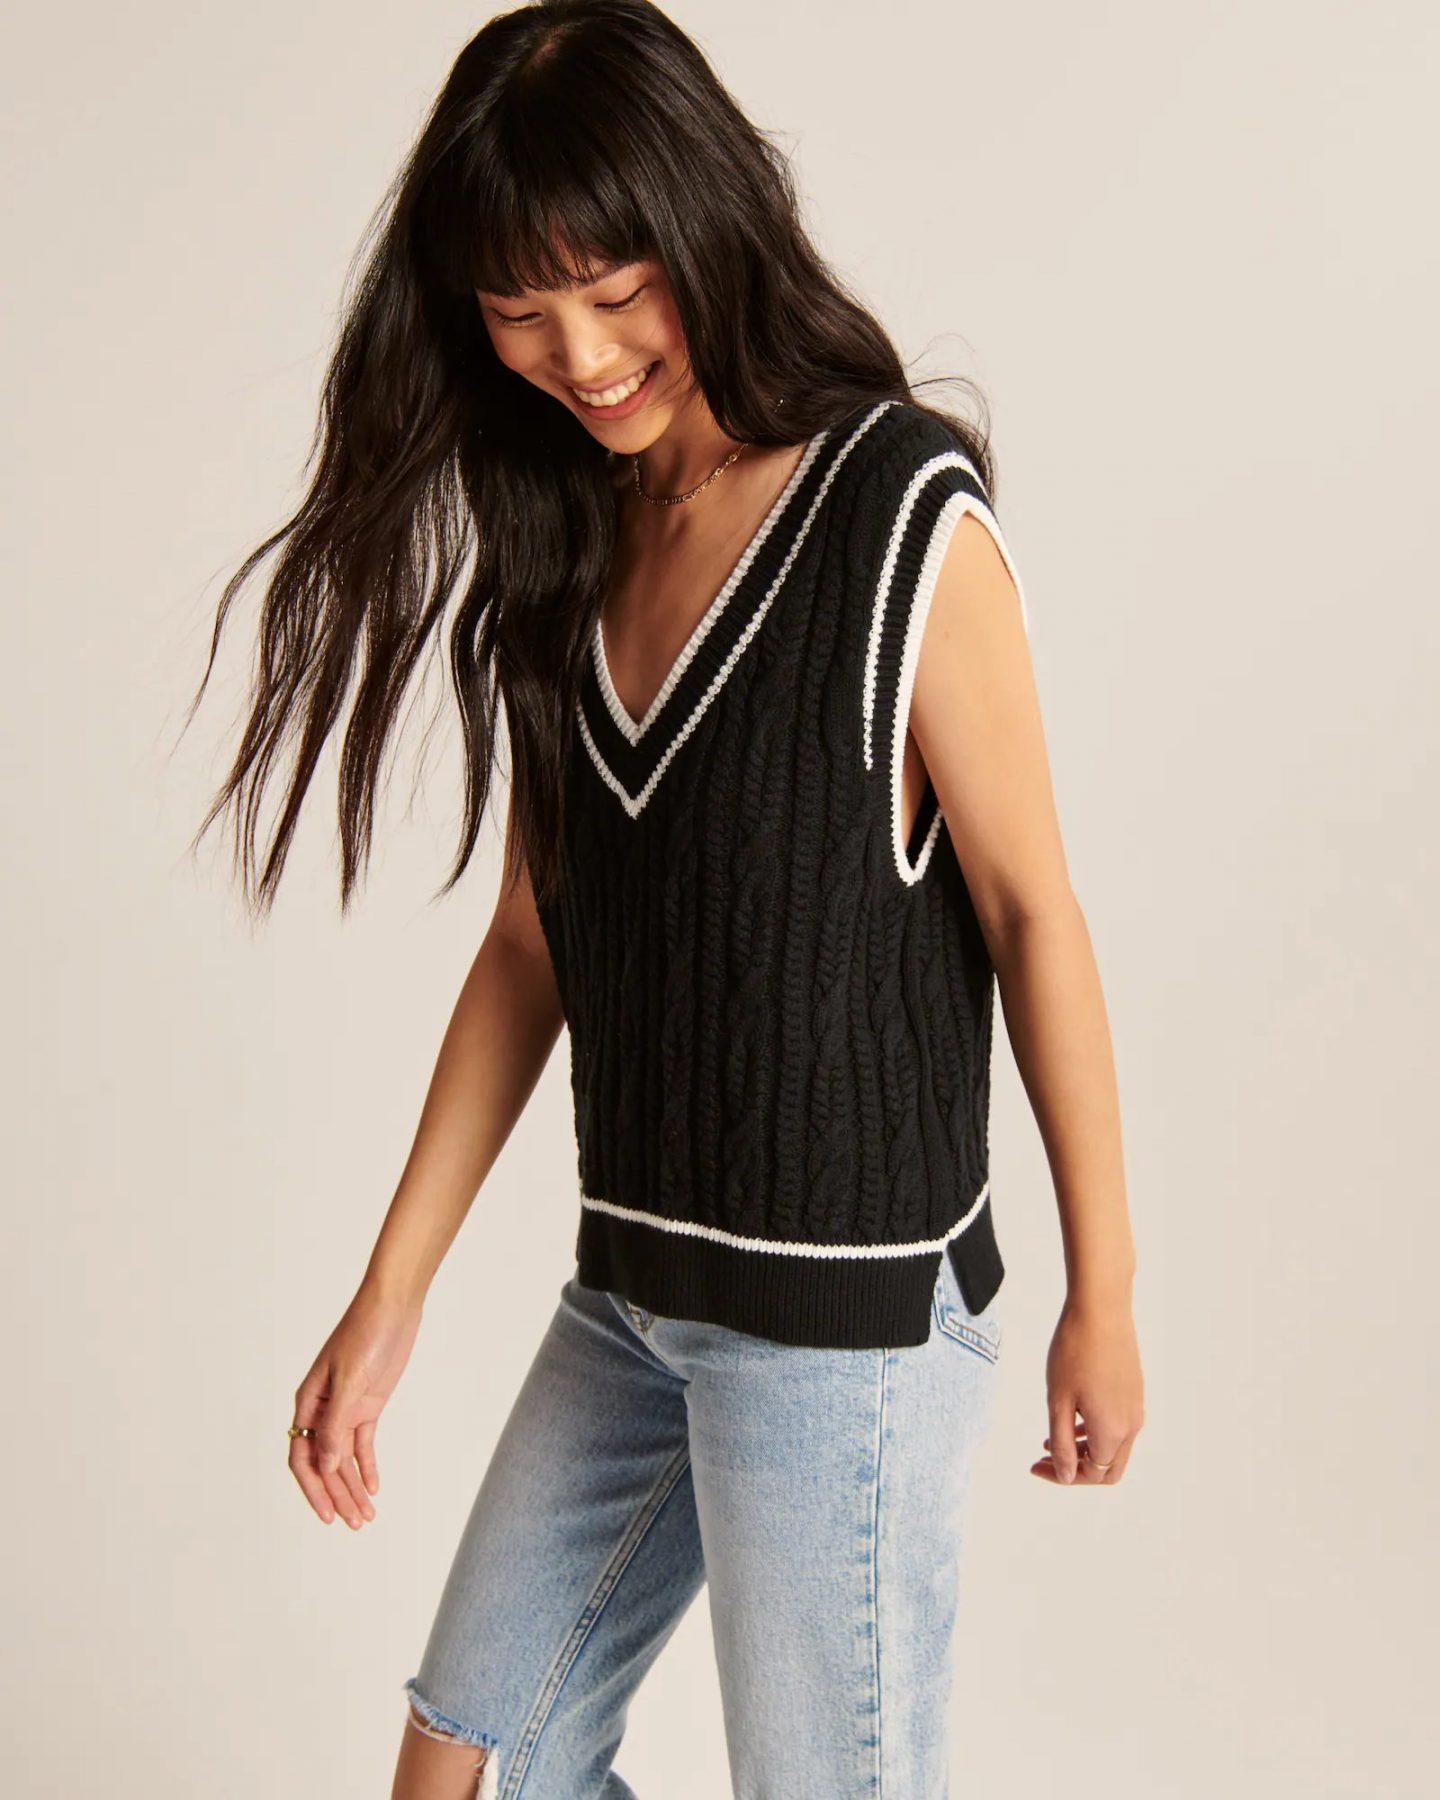 Black and white preppy vest